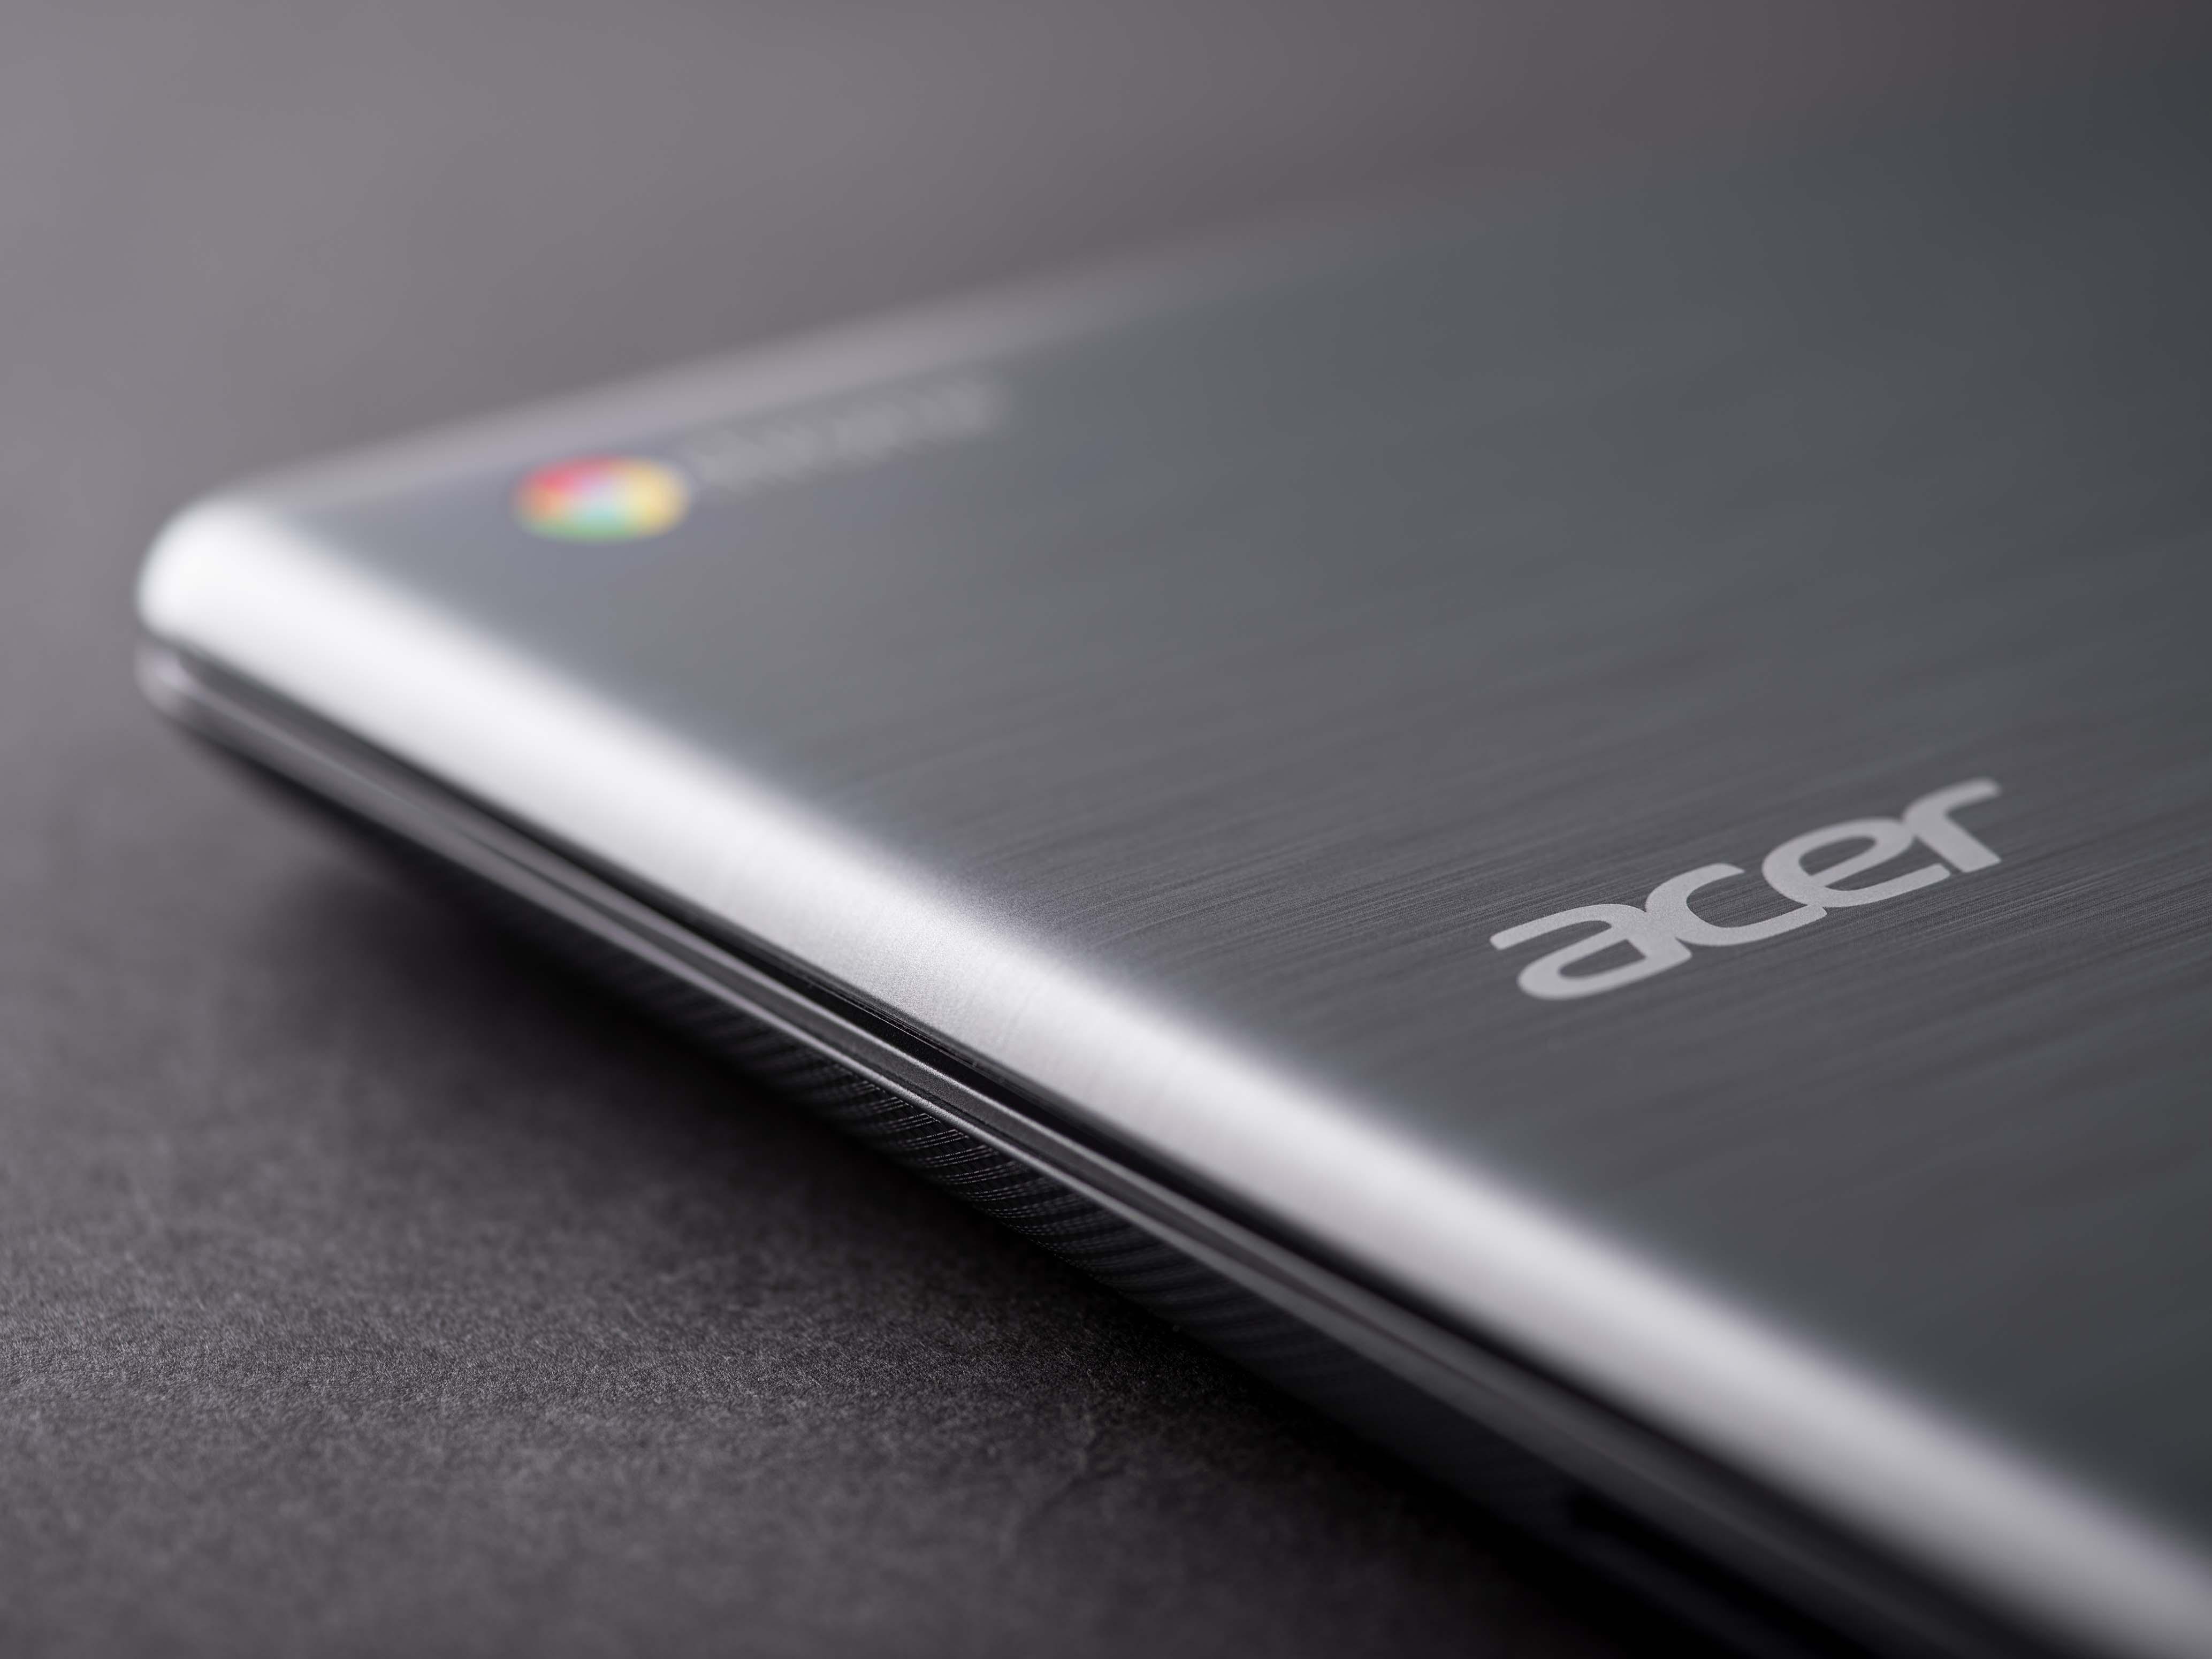 Acer Chromebook 15 : Acer veut démocratiser le Chromebook